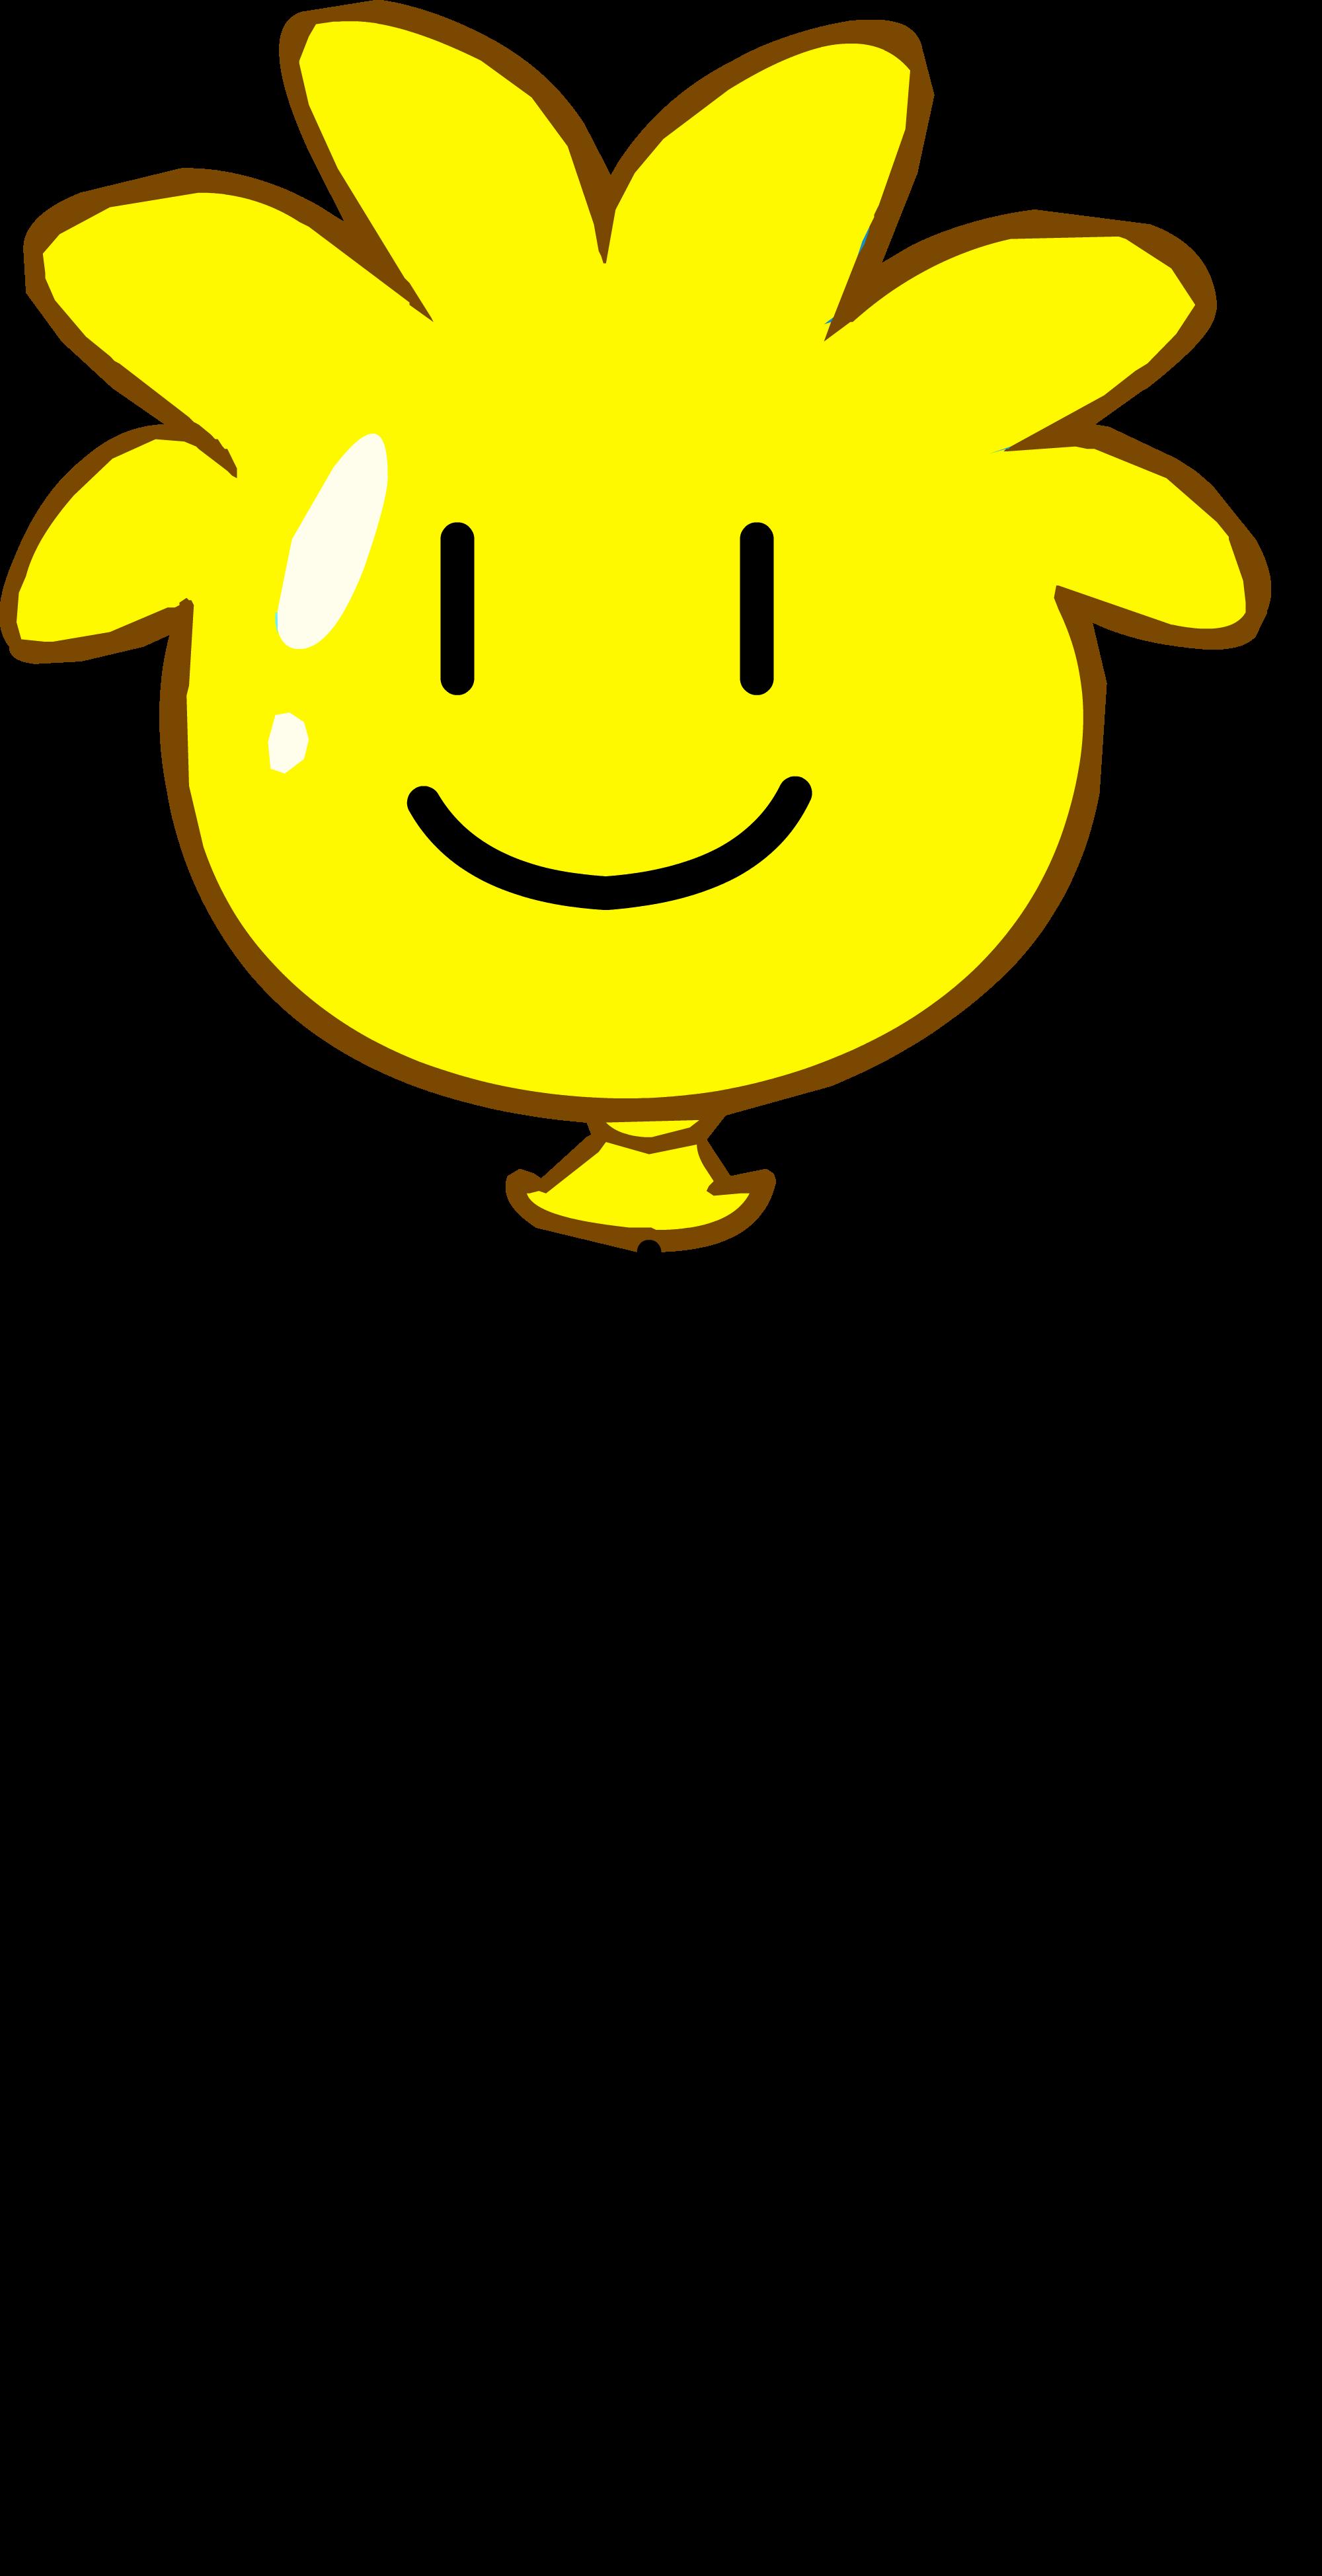 Globo de Puffle Amarillo